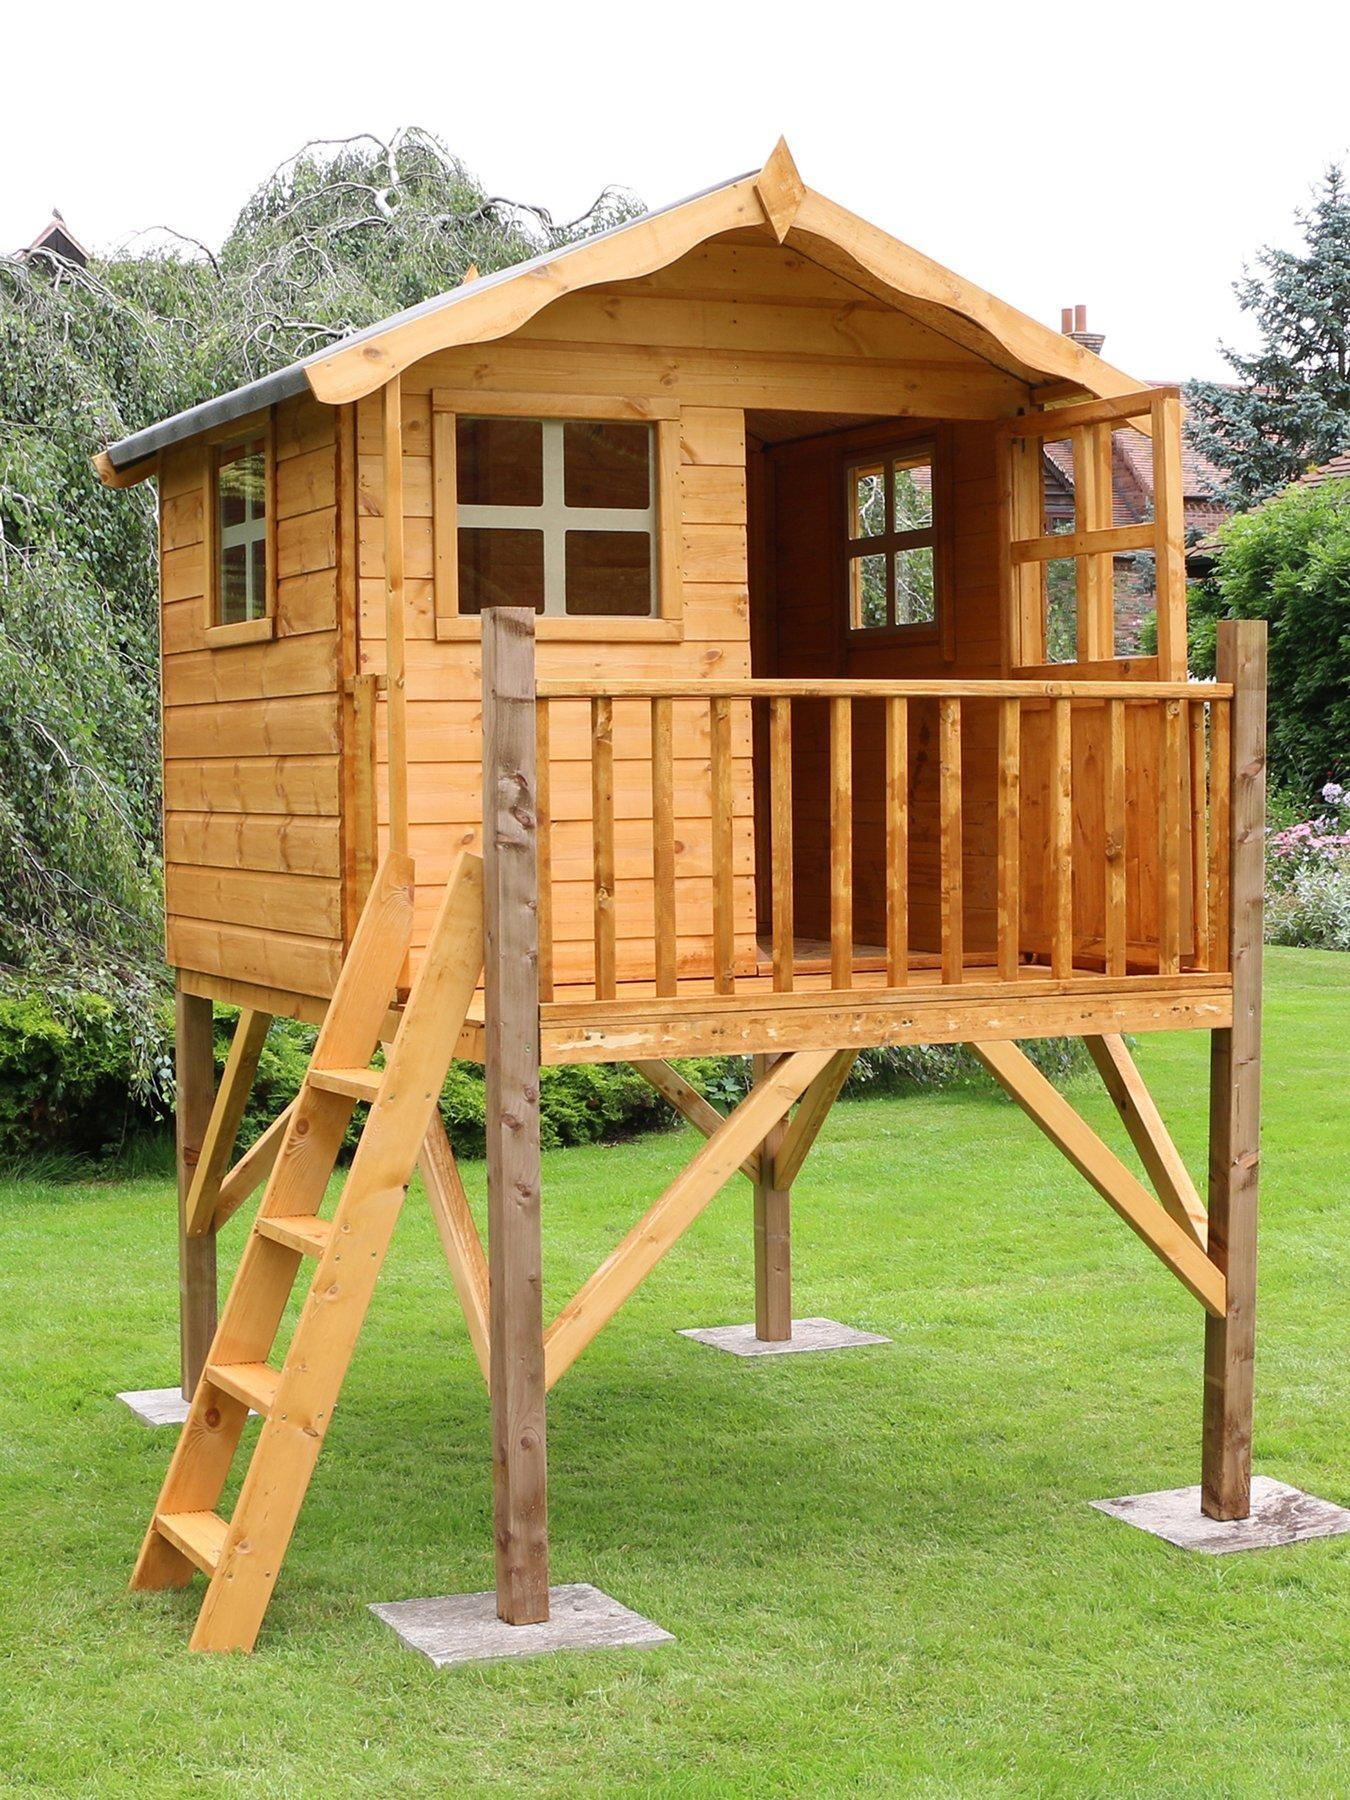 MERCIA 7 x 5ft Poppy Tower Playhouse Play houses, Tree